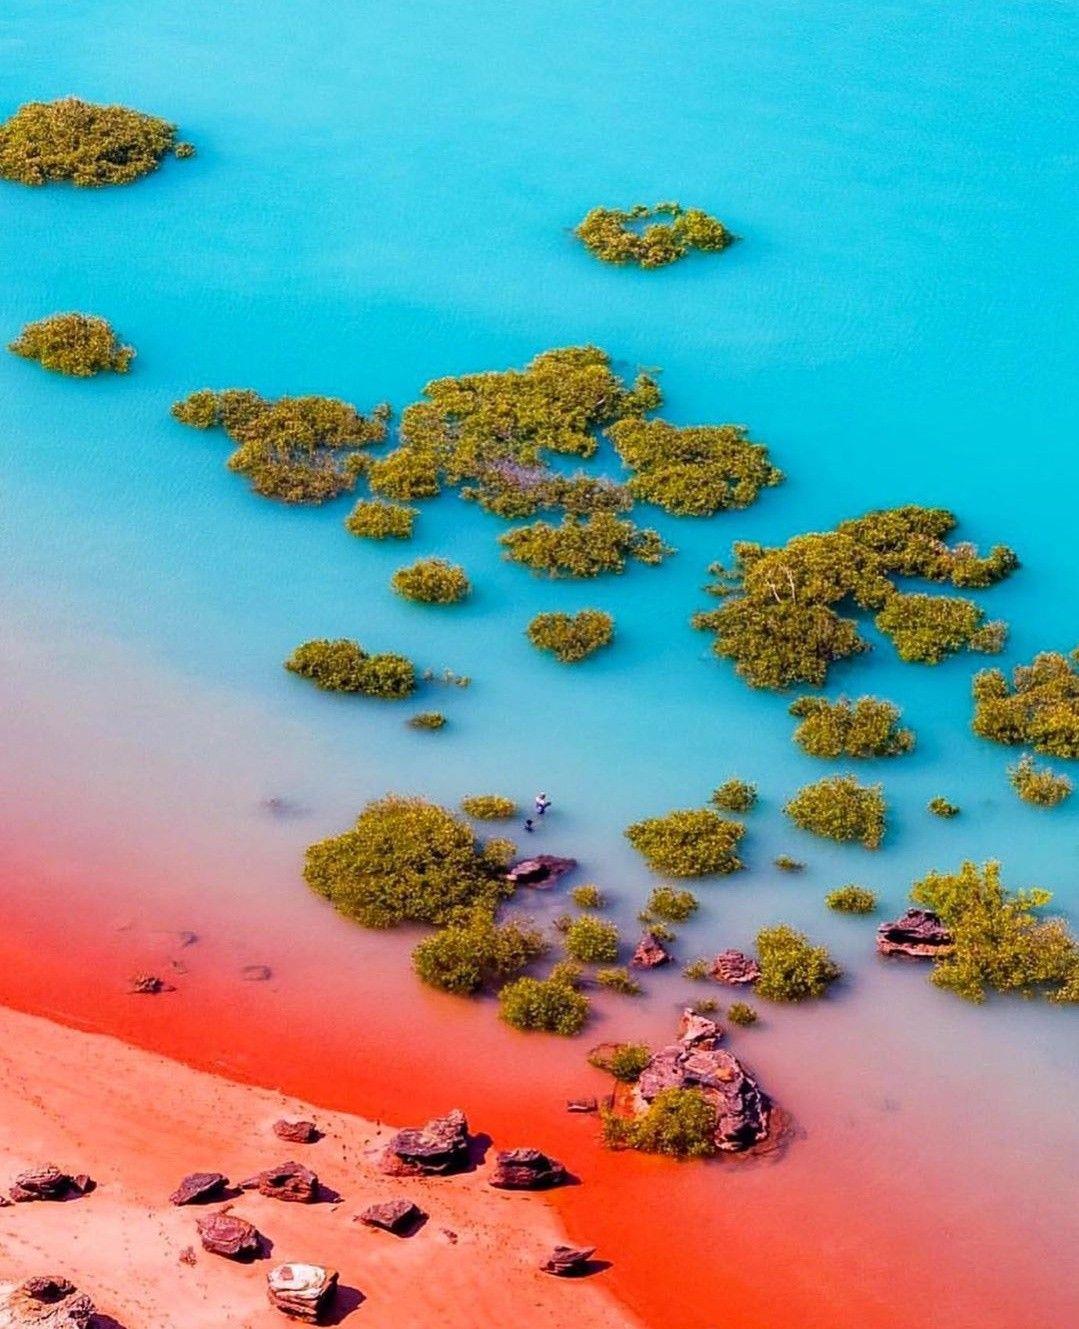 Broome Is A Beach Resort Town In Western Australia S